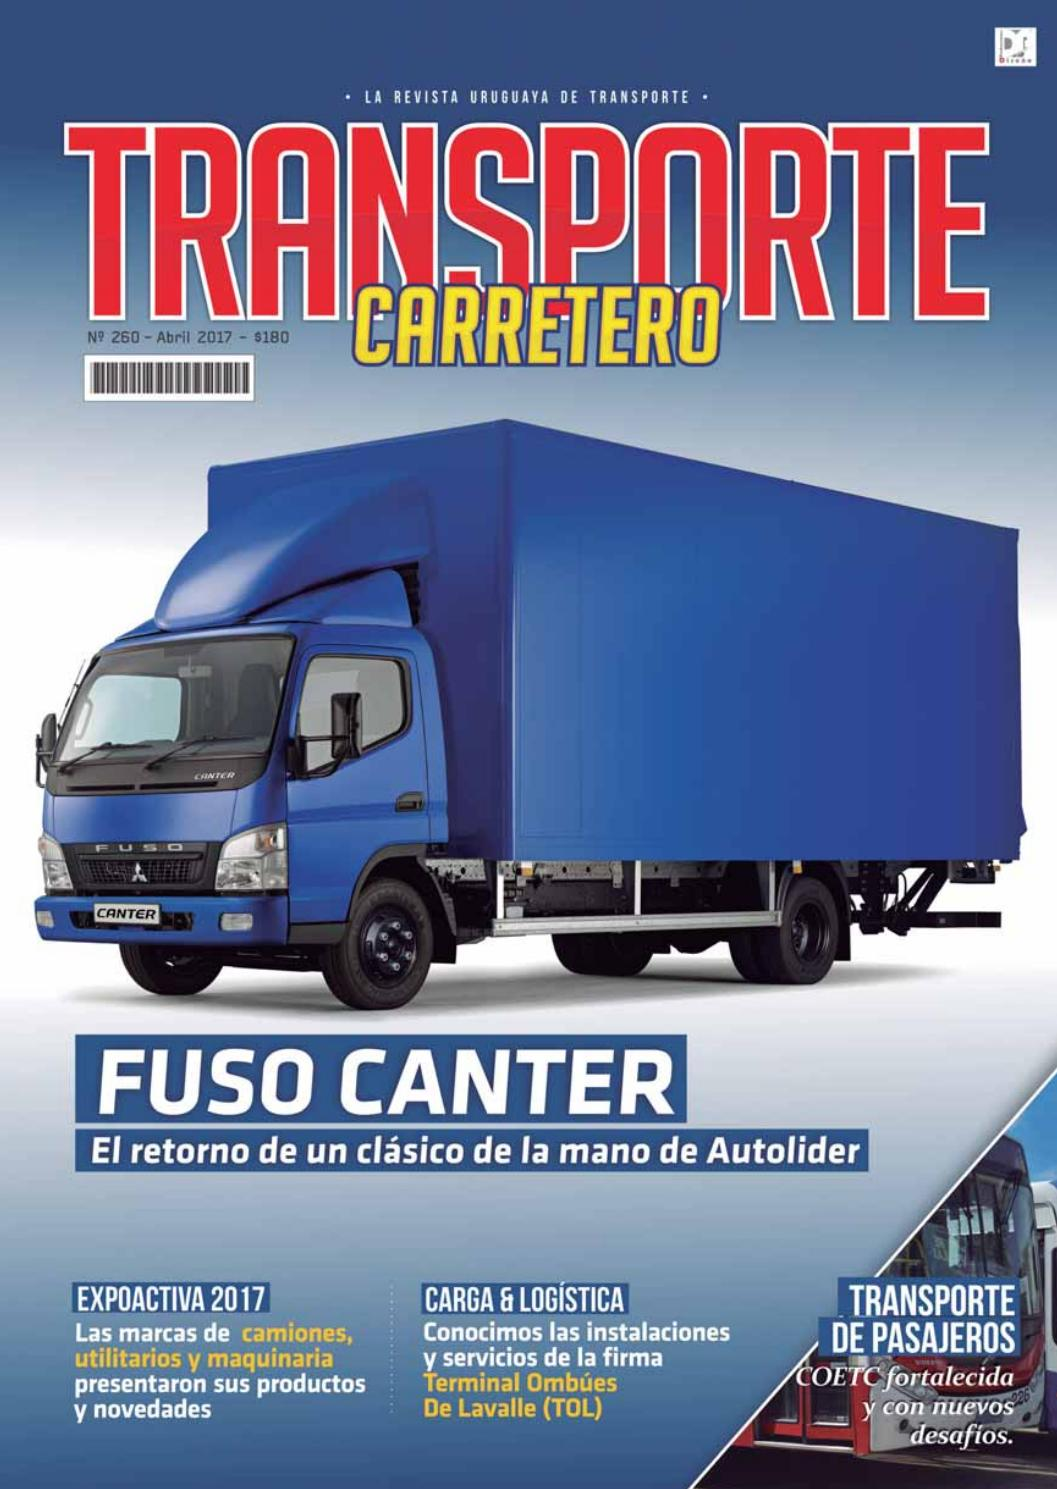 Transporte Carretero Nº 260 - Abril 2017 by Diseño Producciones - issuu